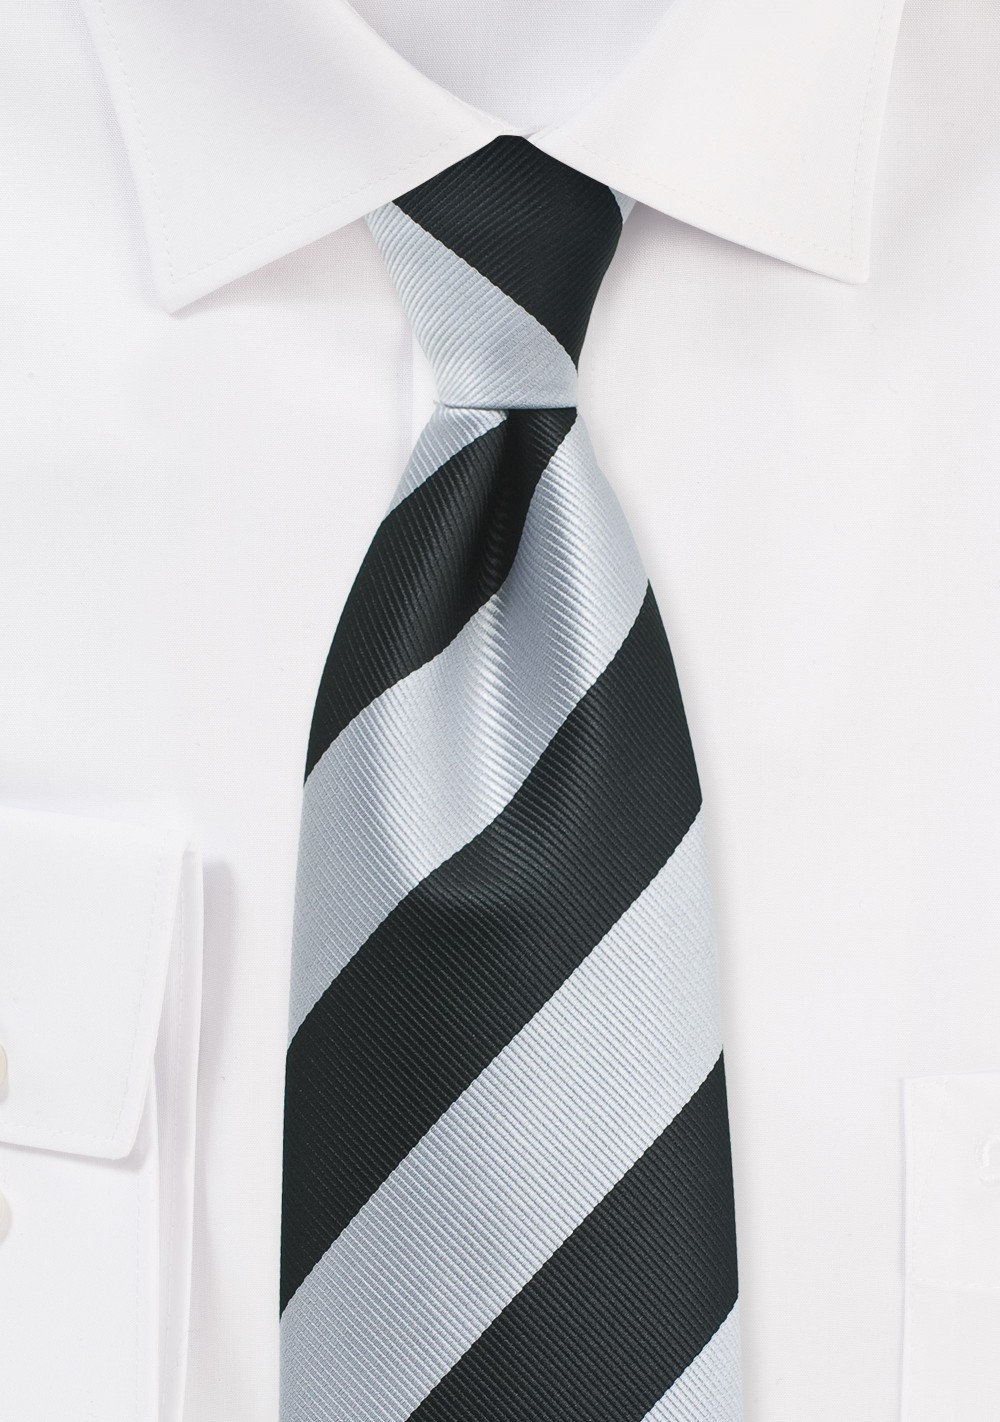 Elegant Silver and Black Repp Striped Tie